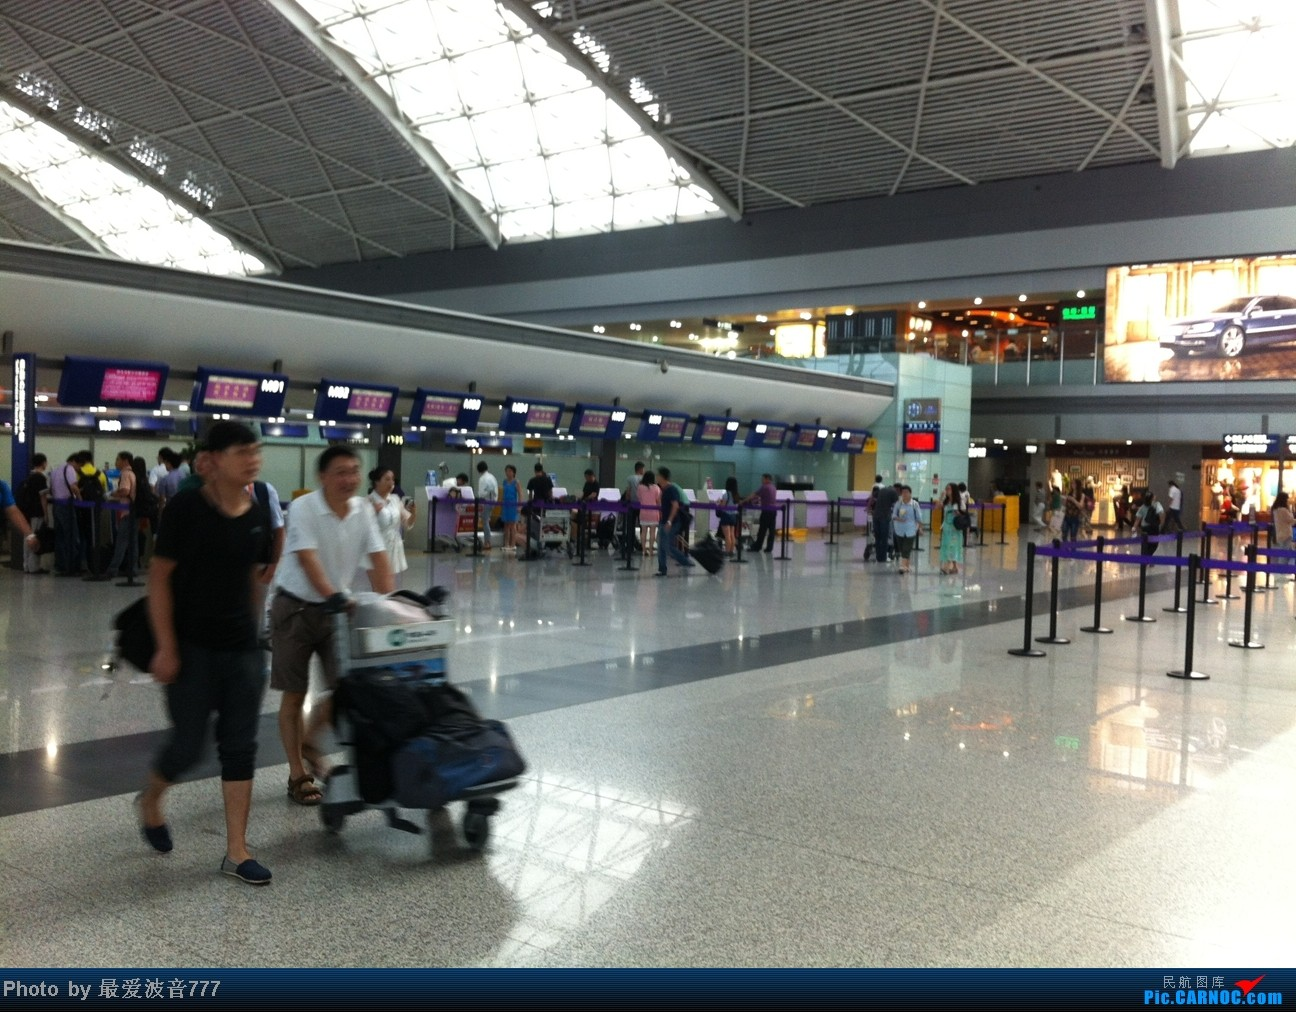 Re:[原创]假期的回国往返之旅 LHR-HKG-CTU-HKG-LHR, CX+CA+KA联合运营    中国成都双流机场